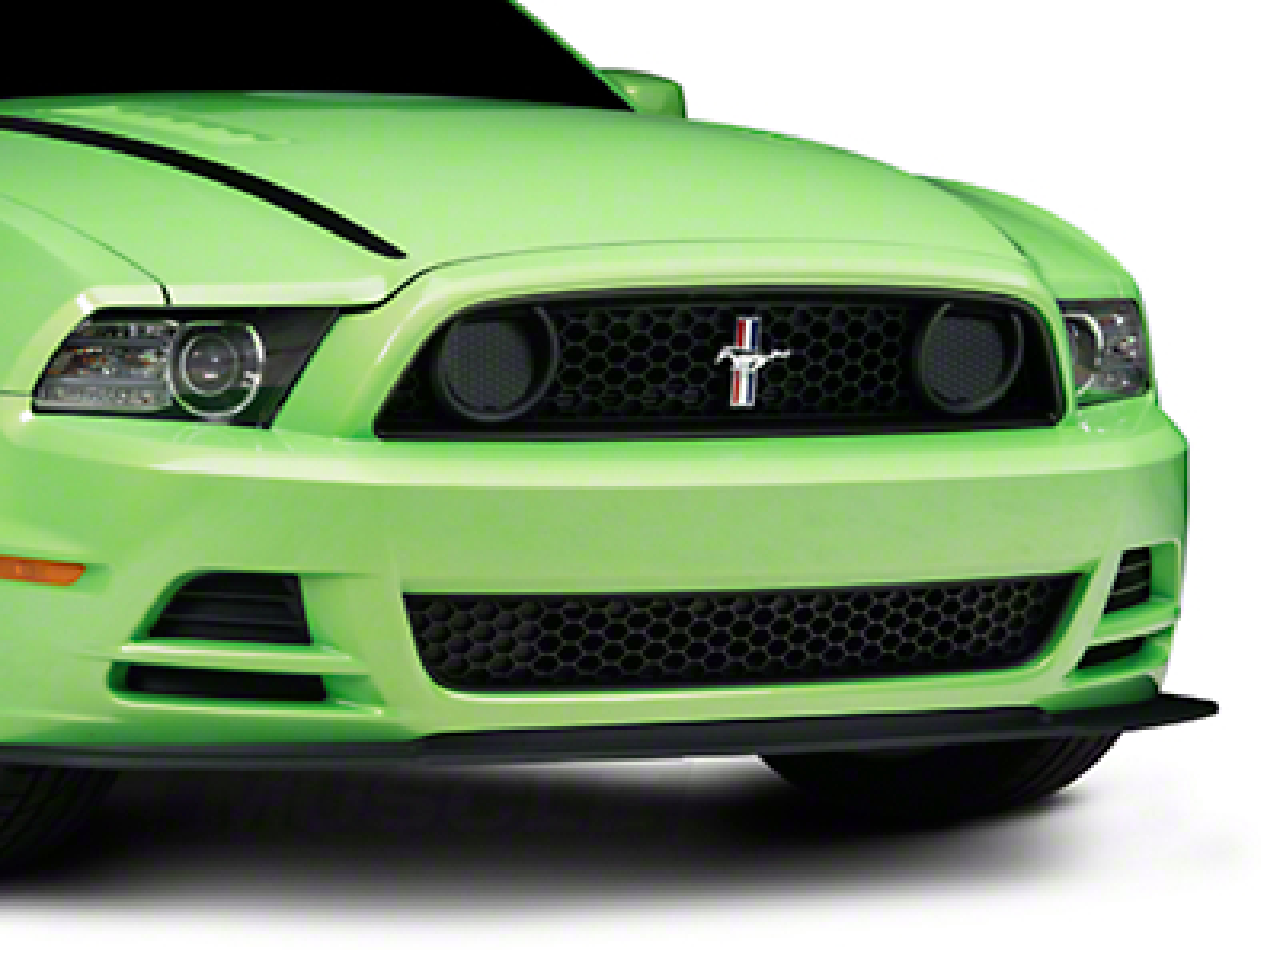 Ford Boss 302 Grille w/ Emblem (13-14 GT; 2013 BOSS 302)